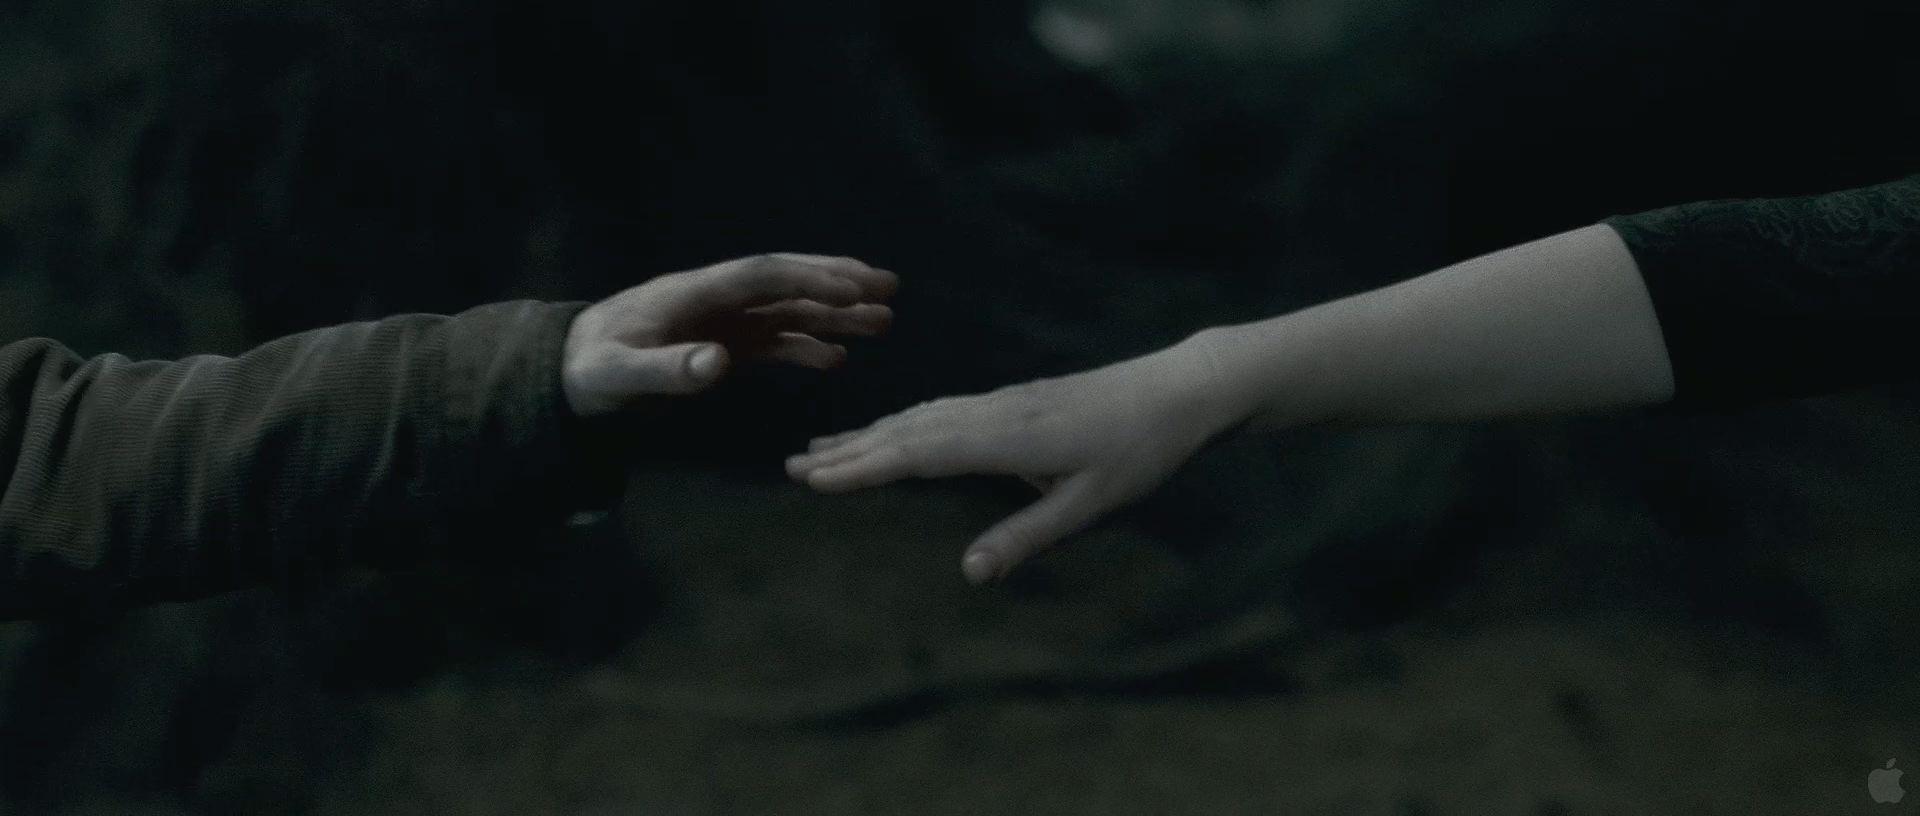 Harry Potter BlogHogwarts HP7 2 Trailer 05